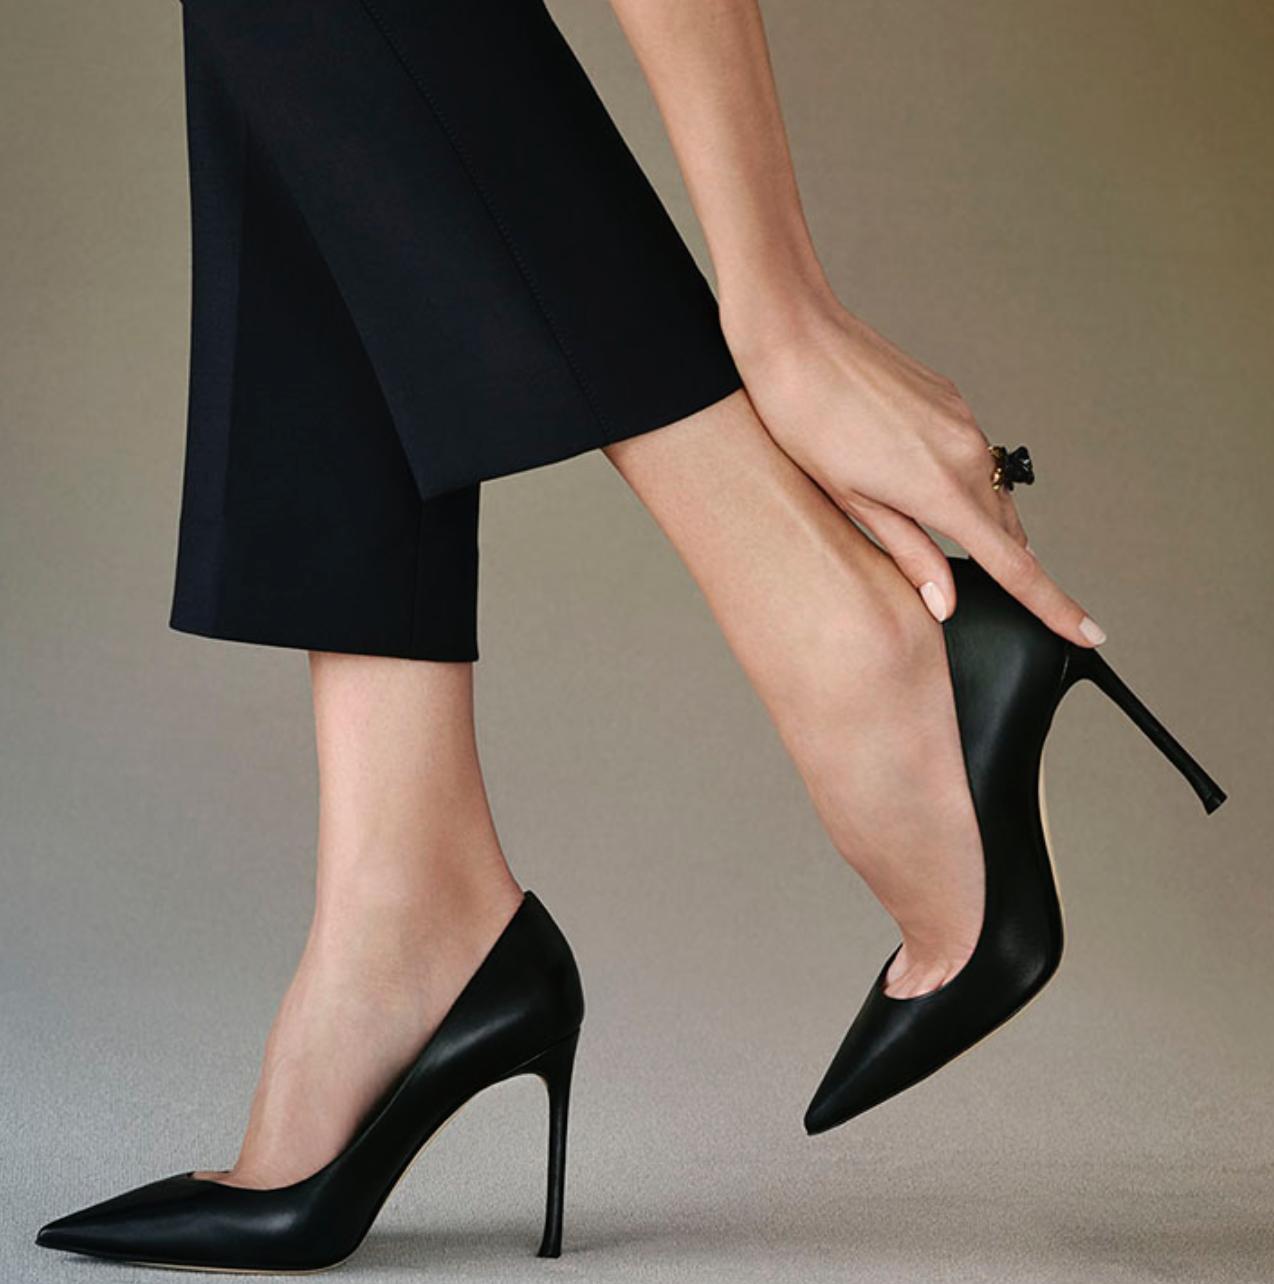 Dior Introduces The Dioressence Stiletto